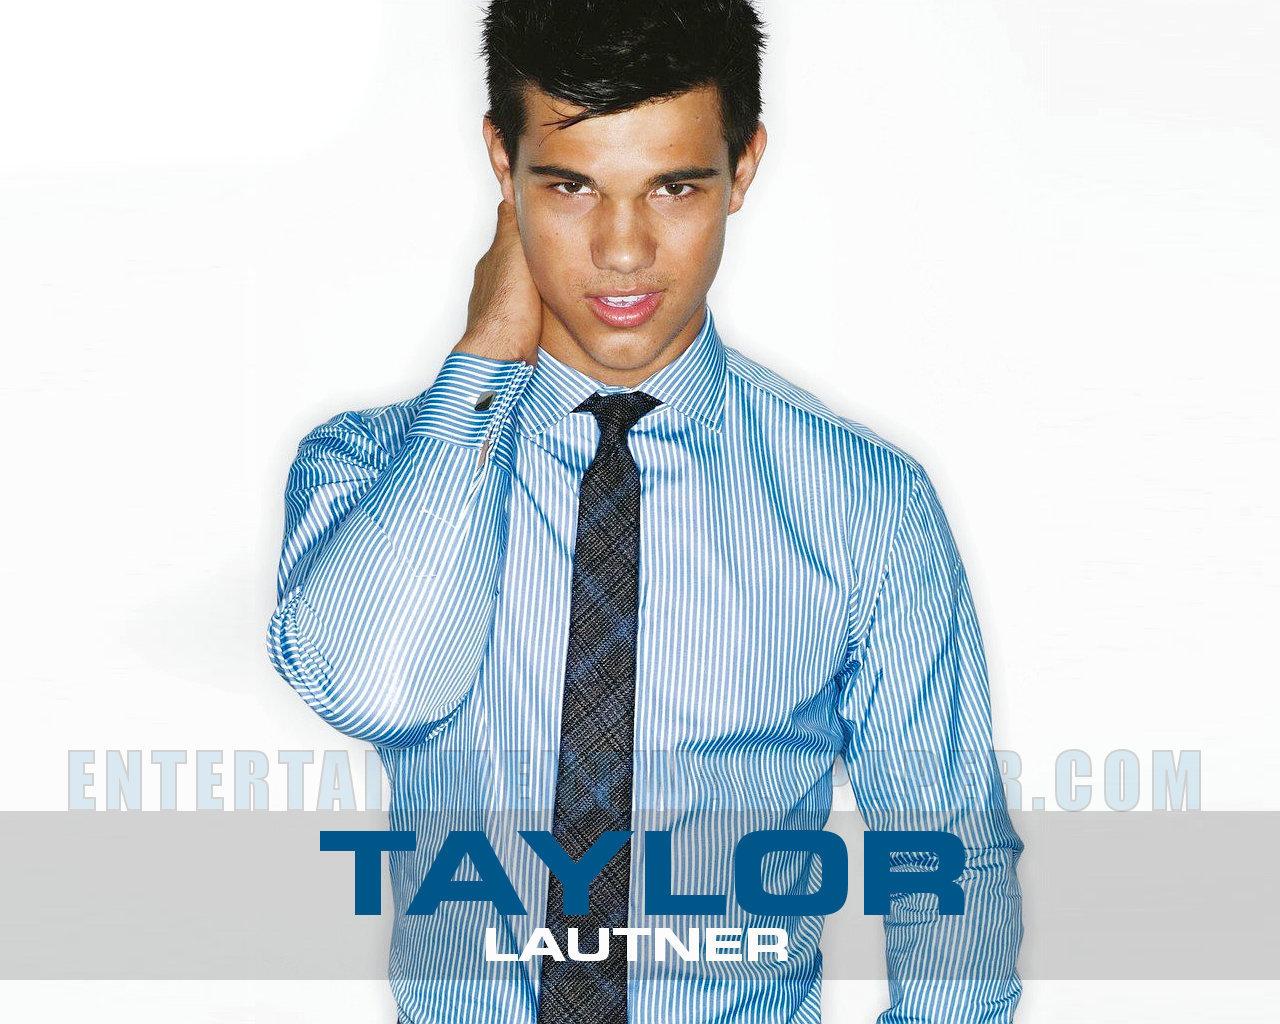 http://3.bp.blogspot.com/_aX0uNSXReV0/TBxz5v3OBnI/AAAAAAAAAjk/NLRMlCqnoGs/s1600/Taylor-Lautner-taylor-lautner-12054479-1280-1024.jpg